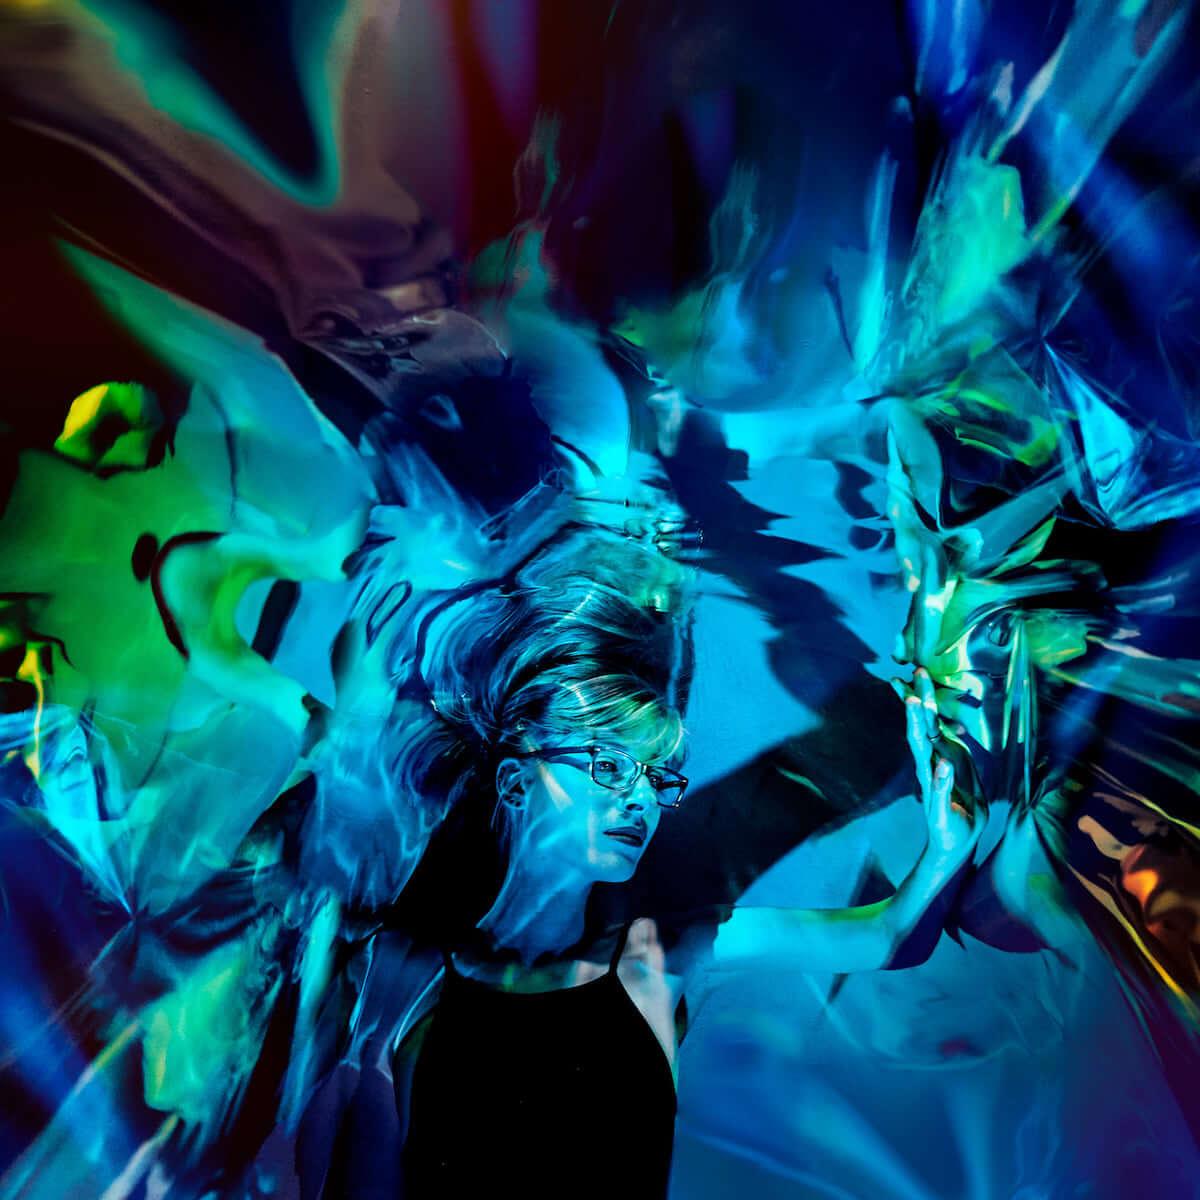 Oneohtrix Point Never来日公演にも参加したケリー・モーランが最新作『Ultraviolet』より「In Parallel」MVを先行公開! music181017_kellymoran_1-1200x1200